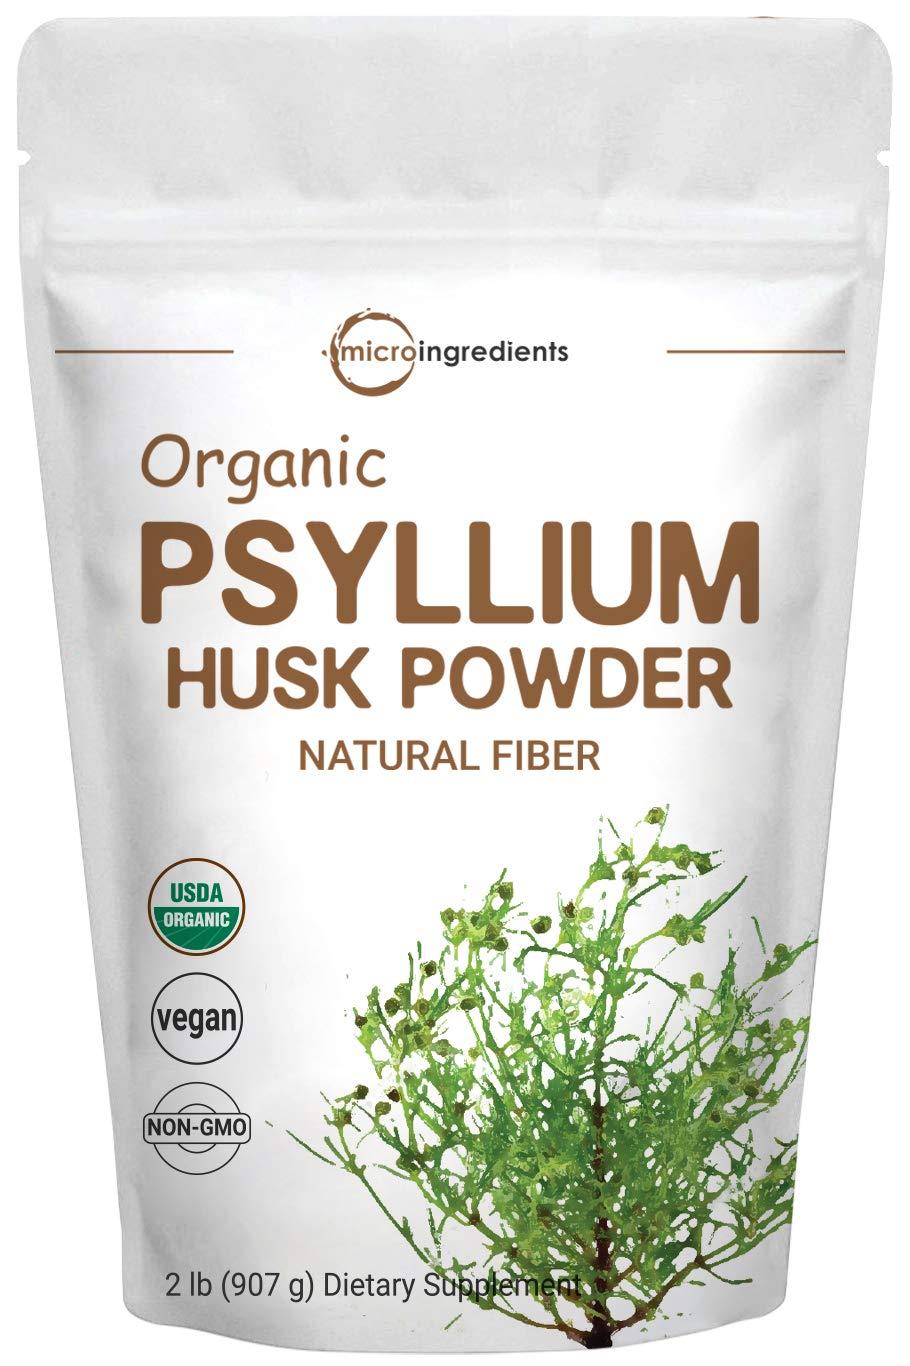 Organic Psyllium Husk Powder, 2 Pound (32 Ounce), Natural Fiber, Perfect for Baking, Smoothie and Beverage, No GMOs and Vegan Friendly